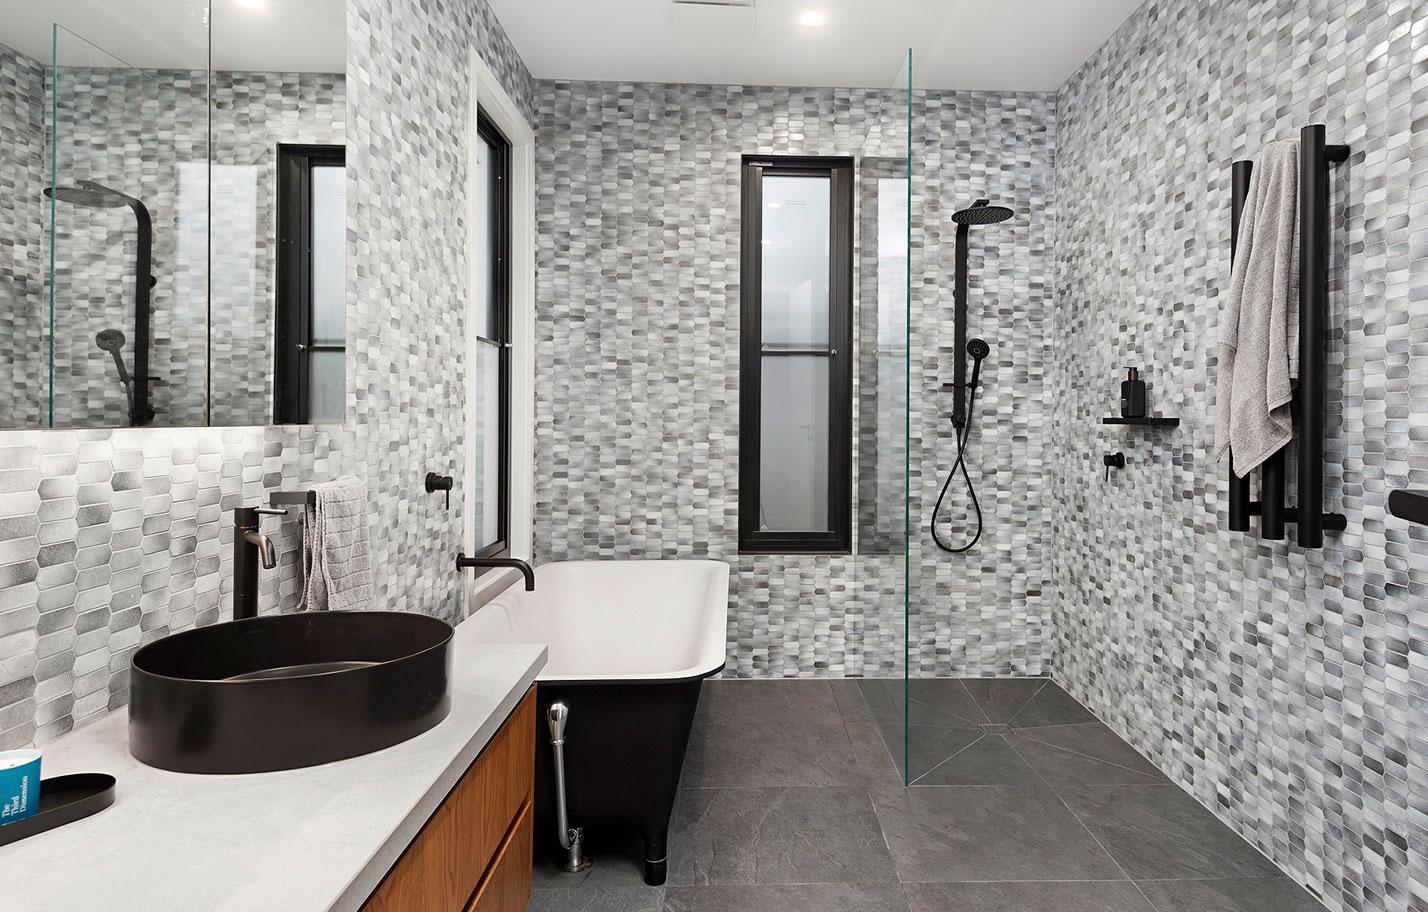 Basalt tile collection